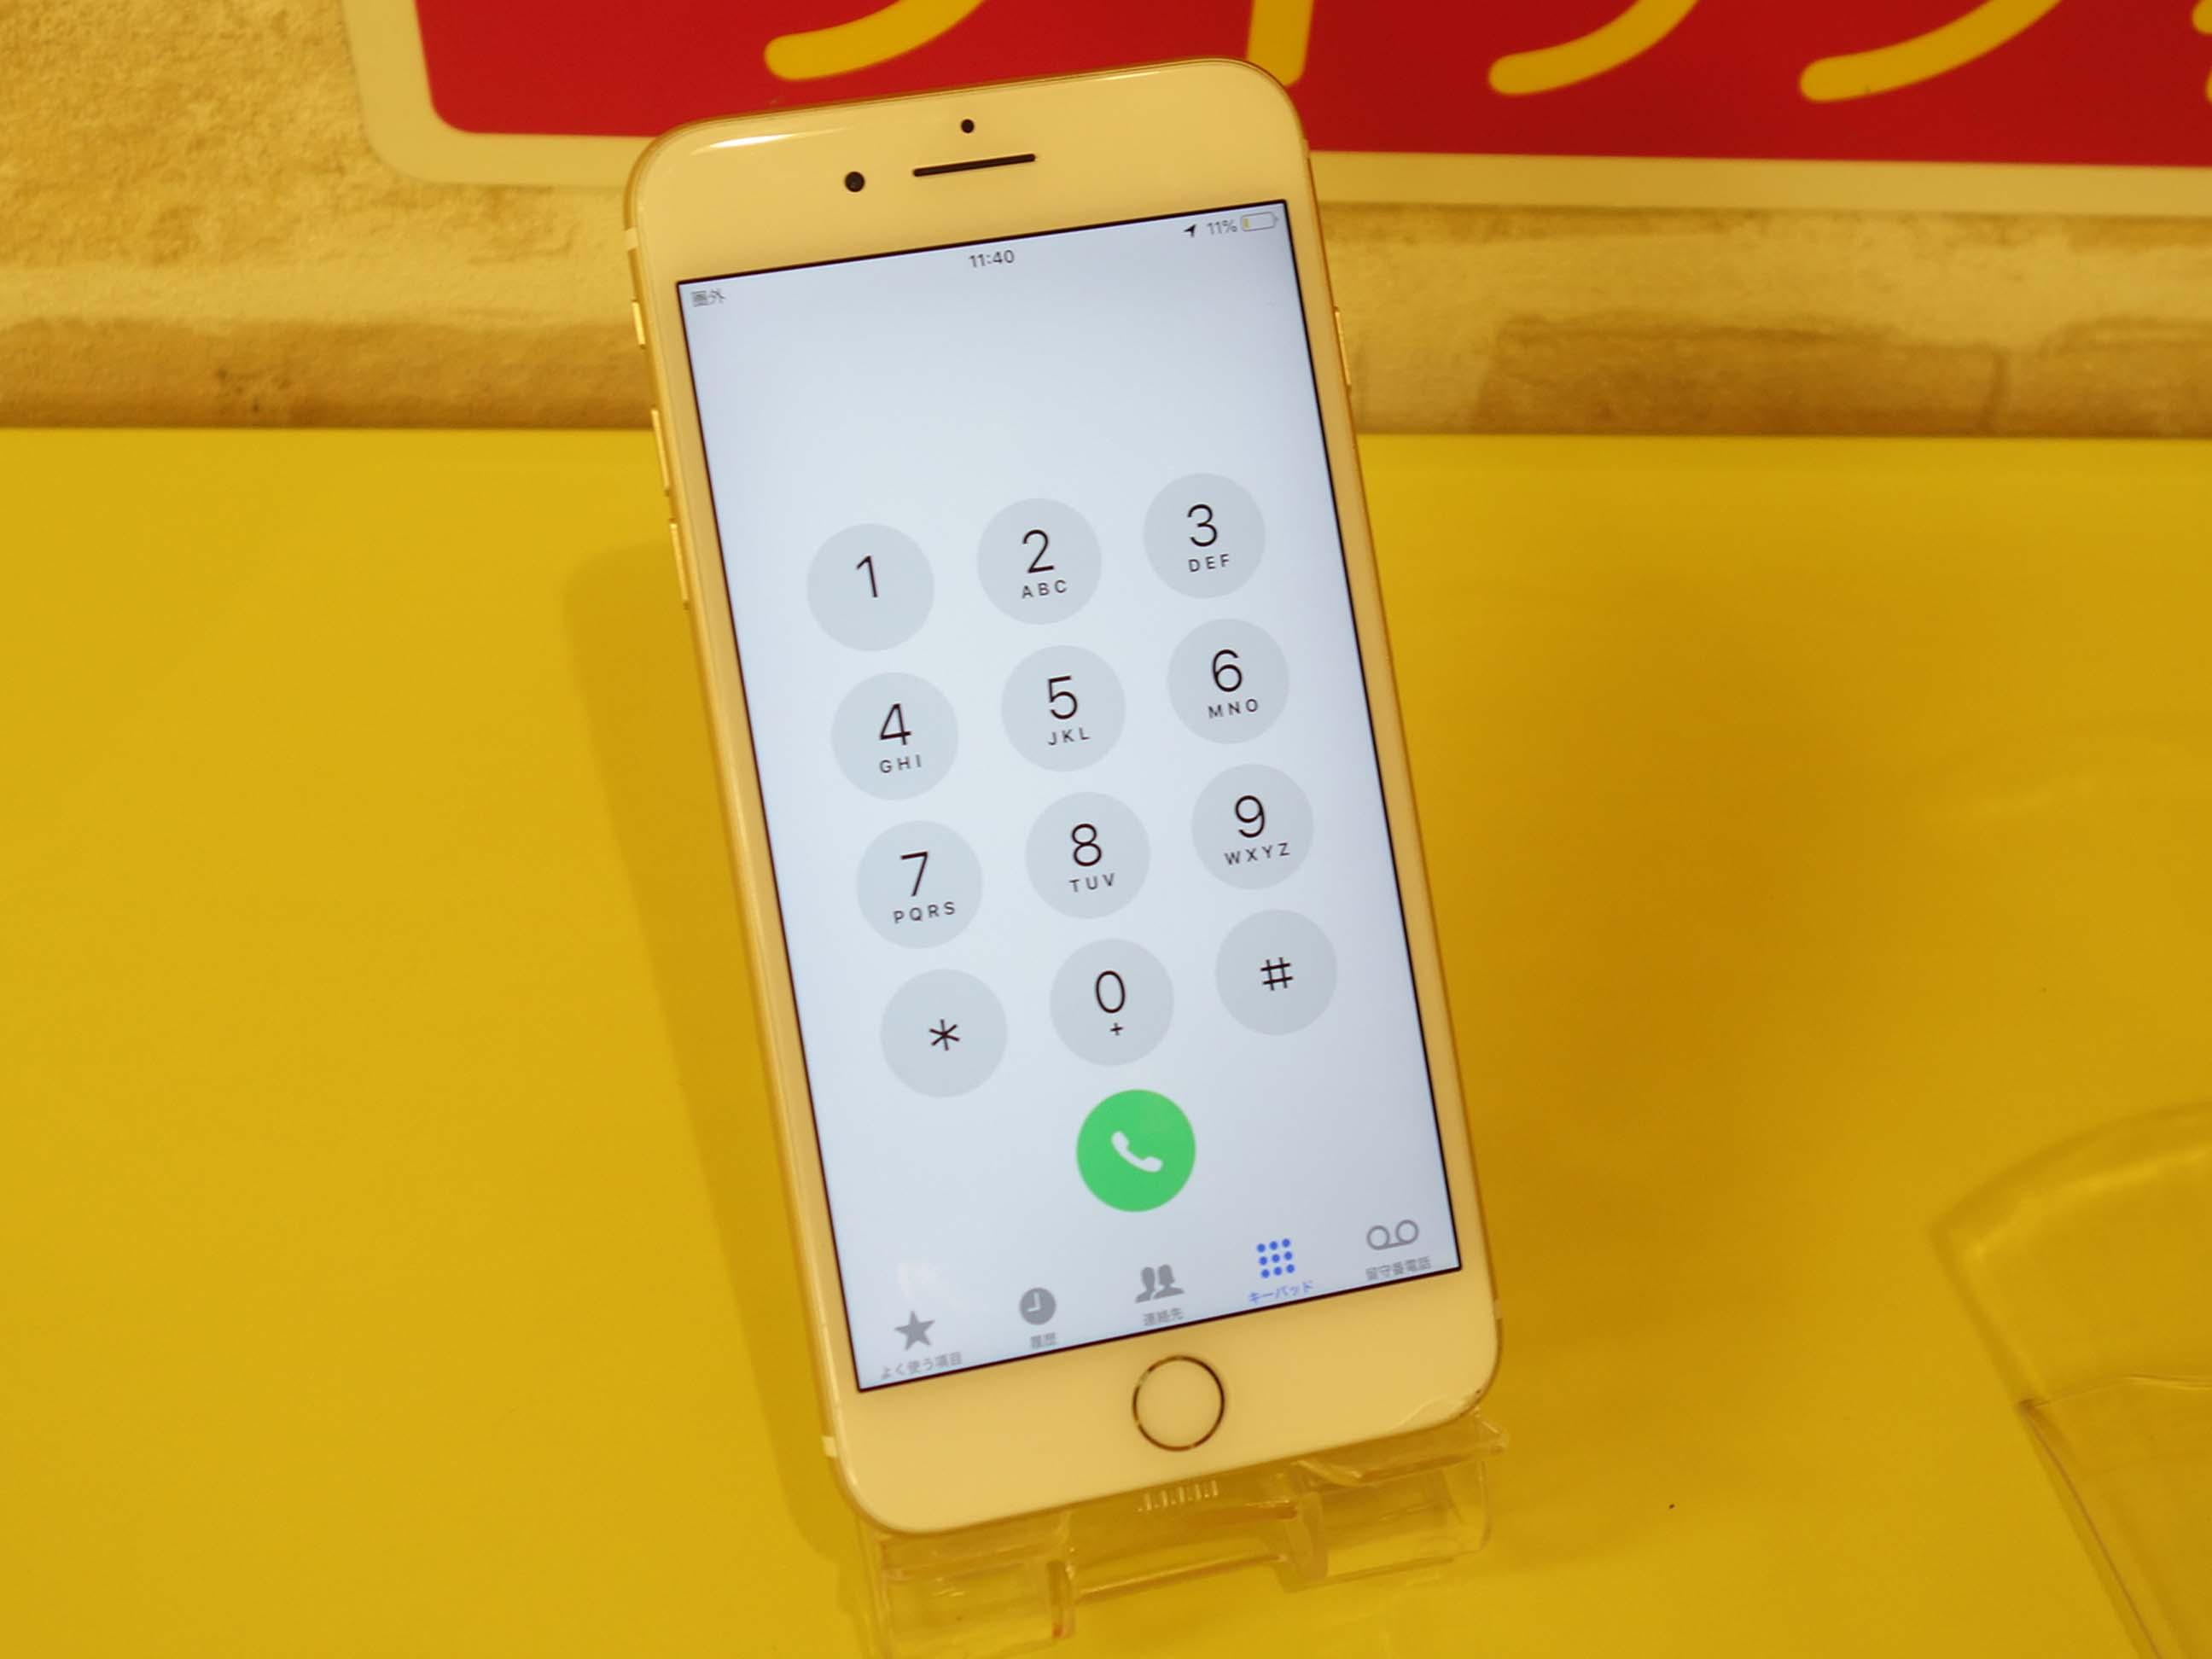 iPhone7Plusのガラス交換修理に大府市よりご来店!アイフォン修理のクイック名古屋